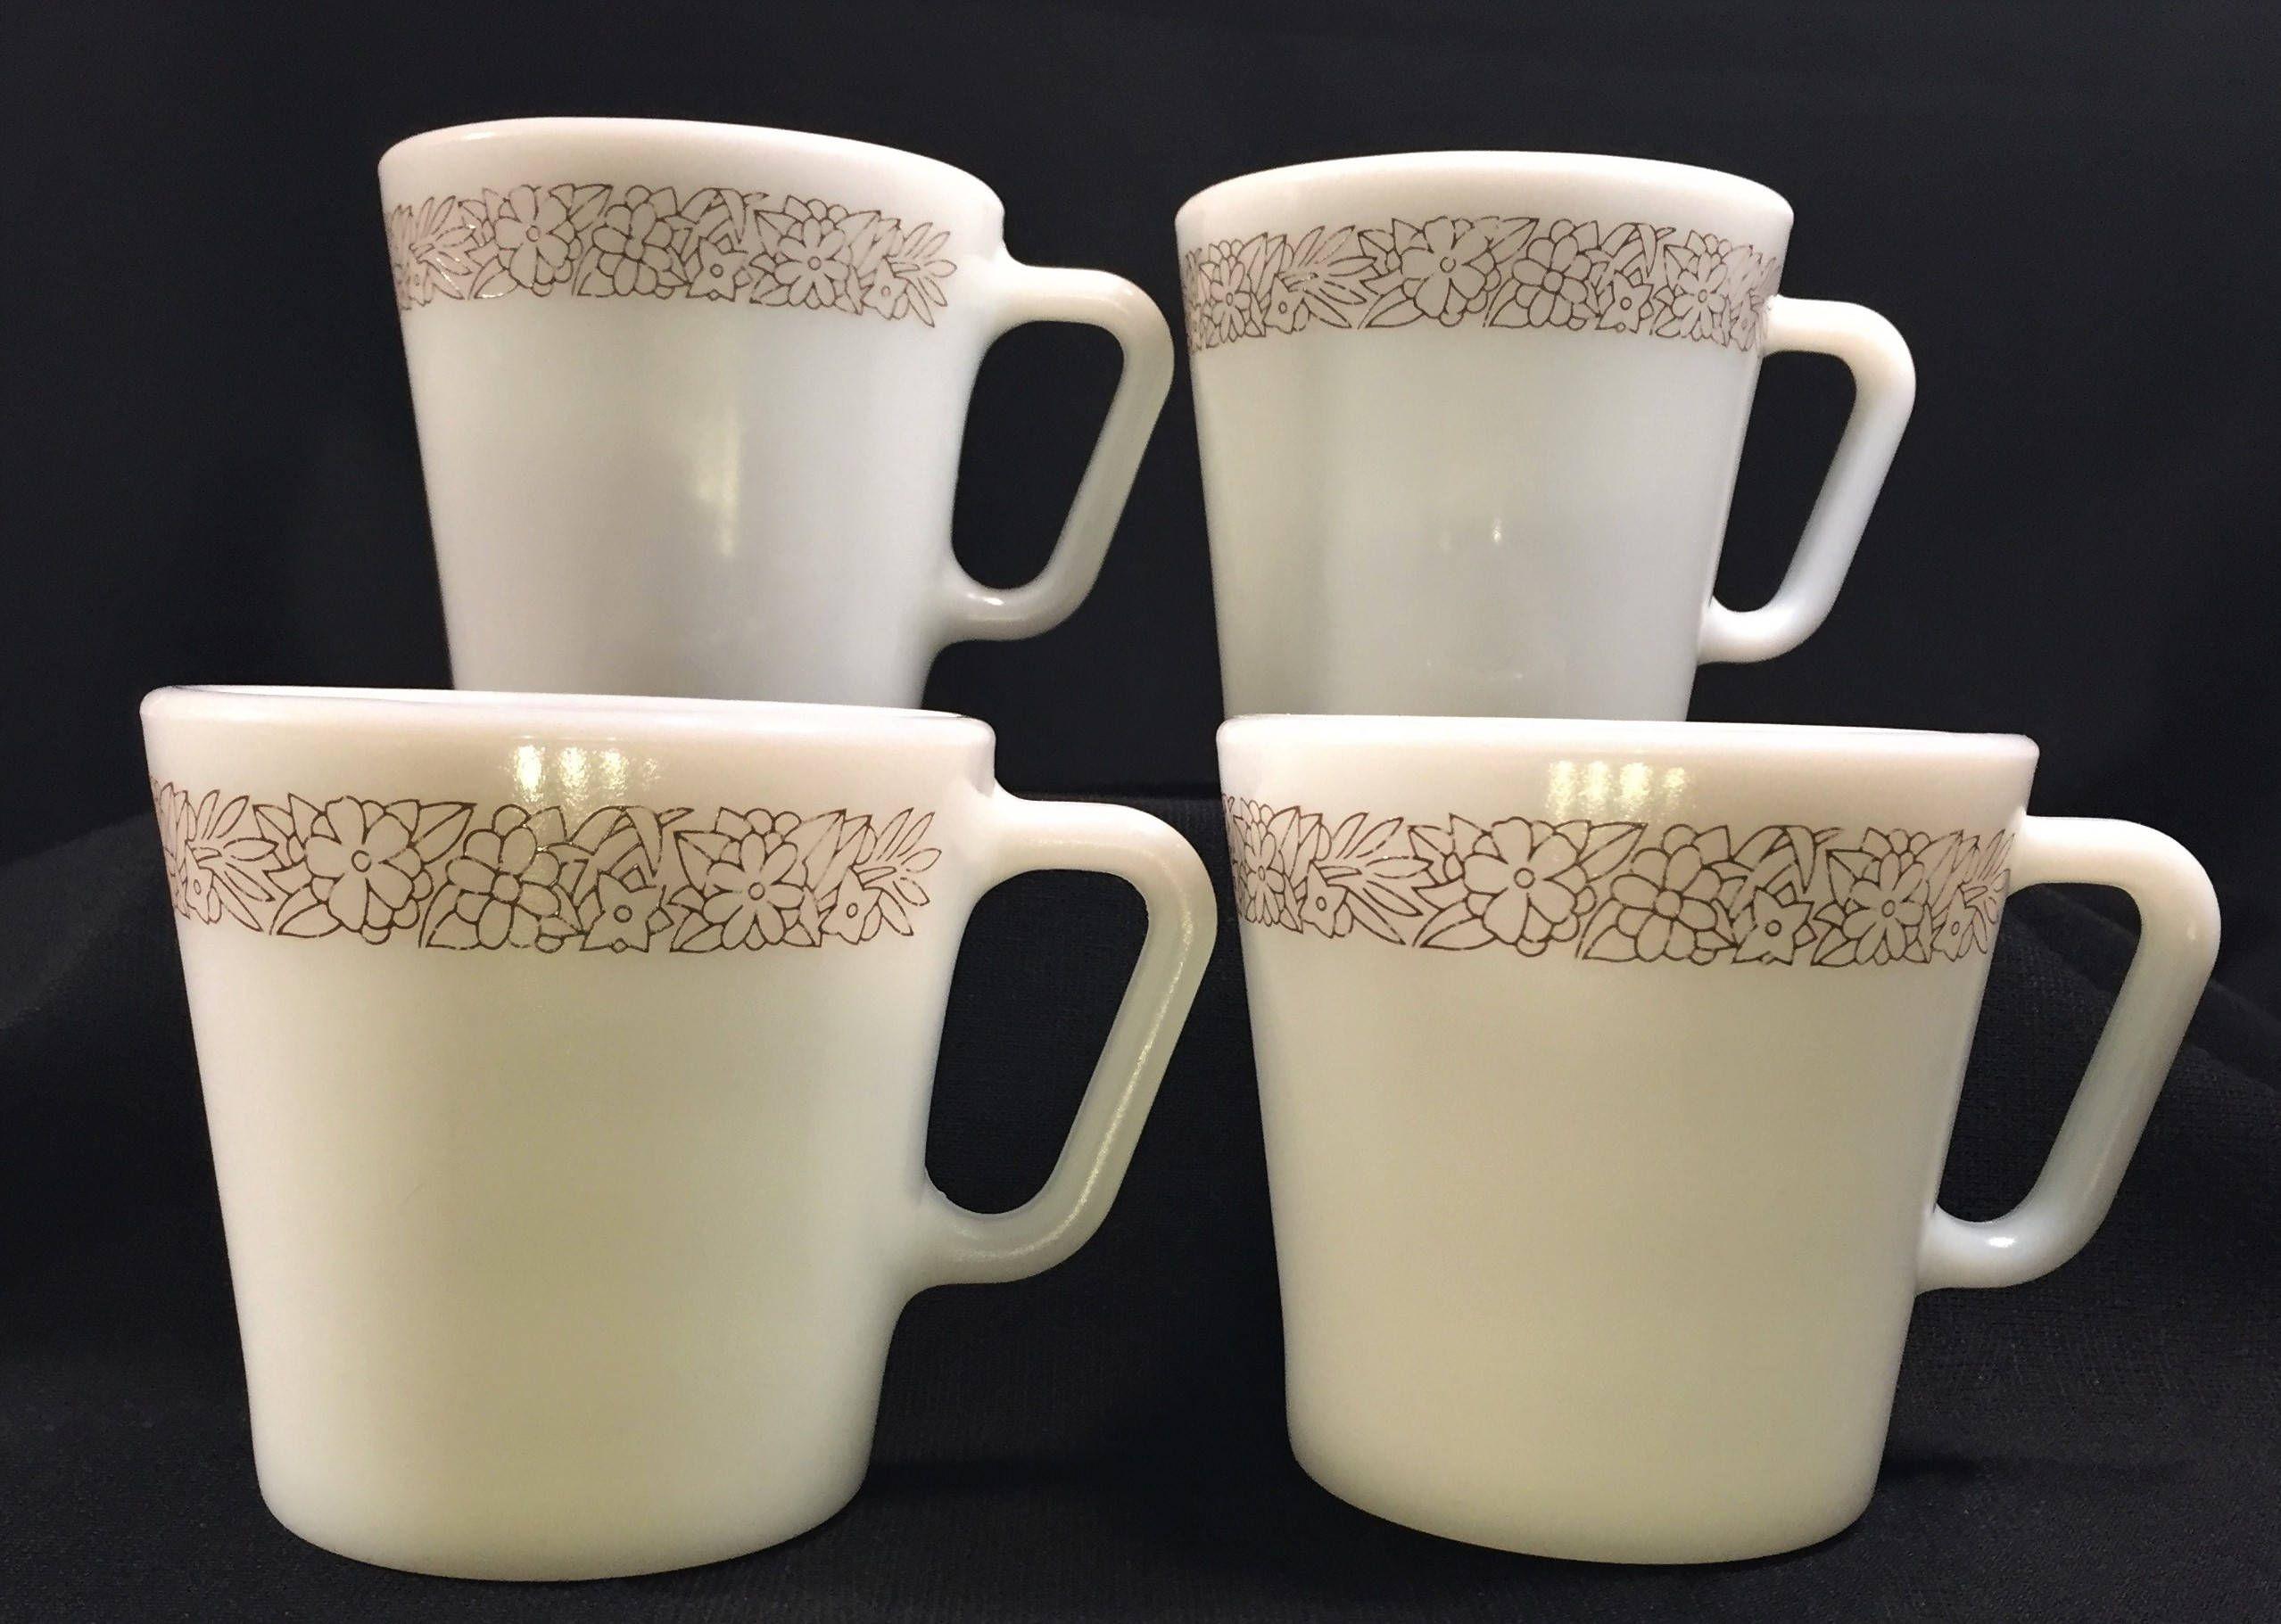 3ed3fd99165 PYREX MUGS, Vintage Pyrex Woodland, D Handled Mugs, Retro Coffee ...